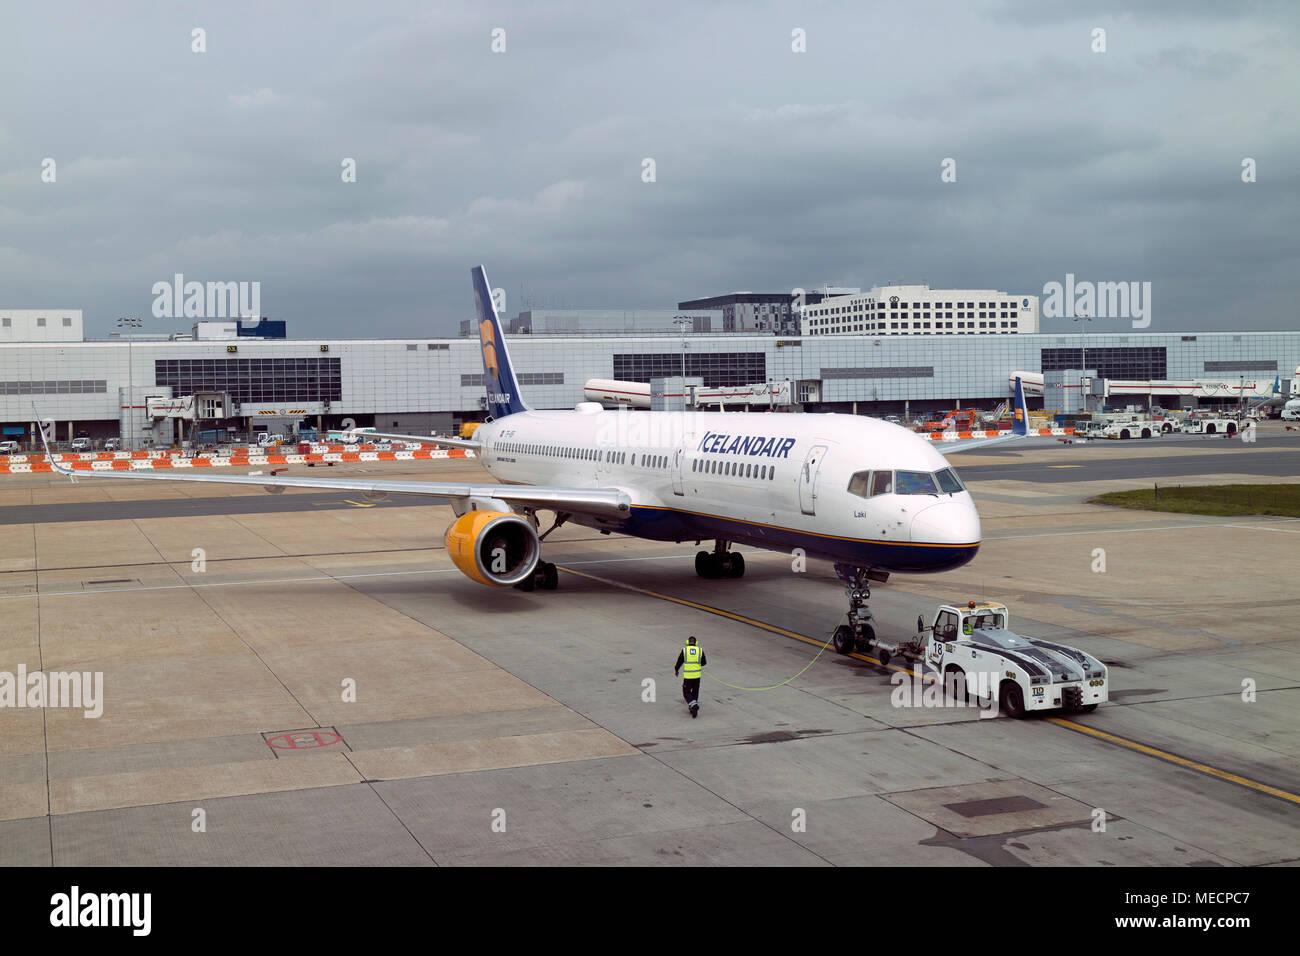 London Gatwick Airport, Surrey, UK 2018. Tug pushing a Icelandair Boeing 757-200 passenger jet to the taxiway - Stock Image